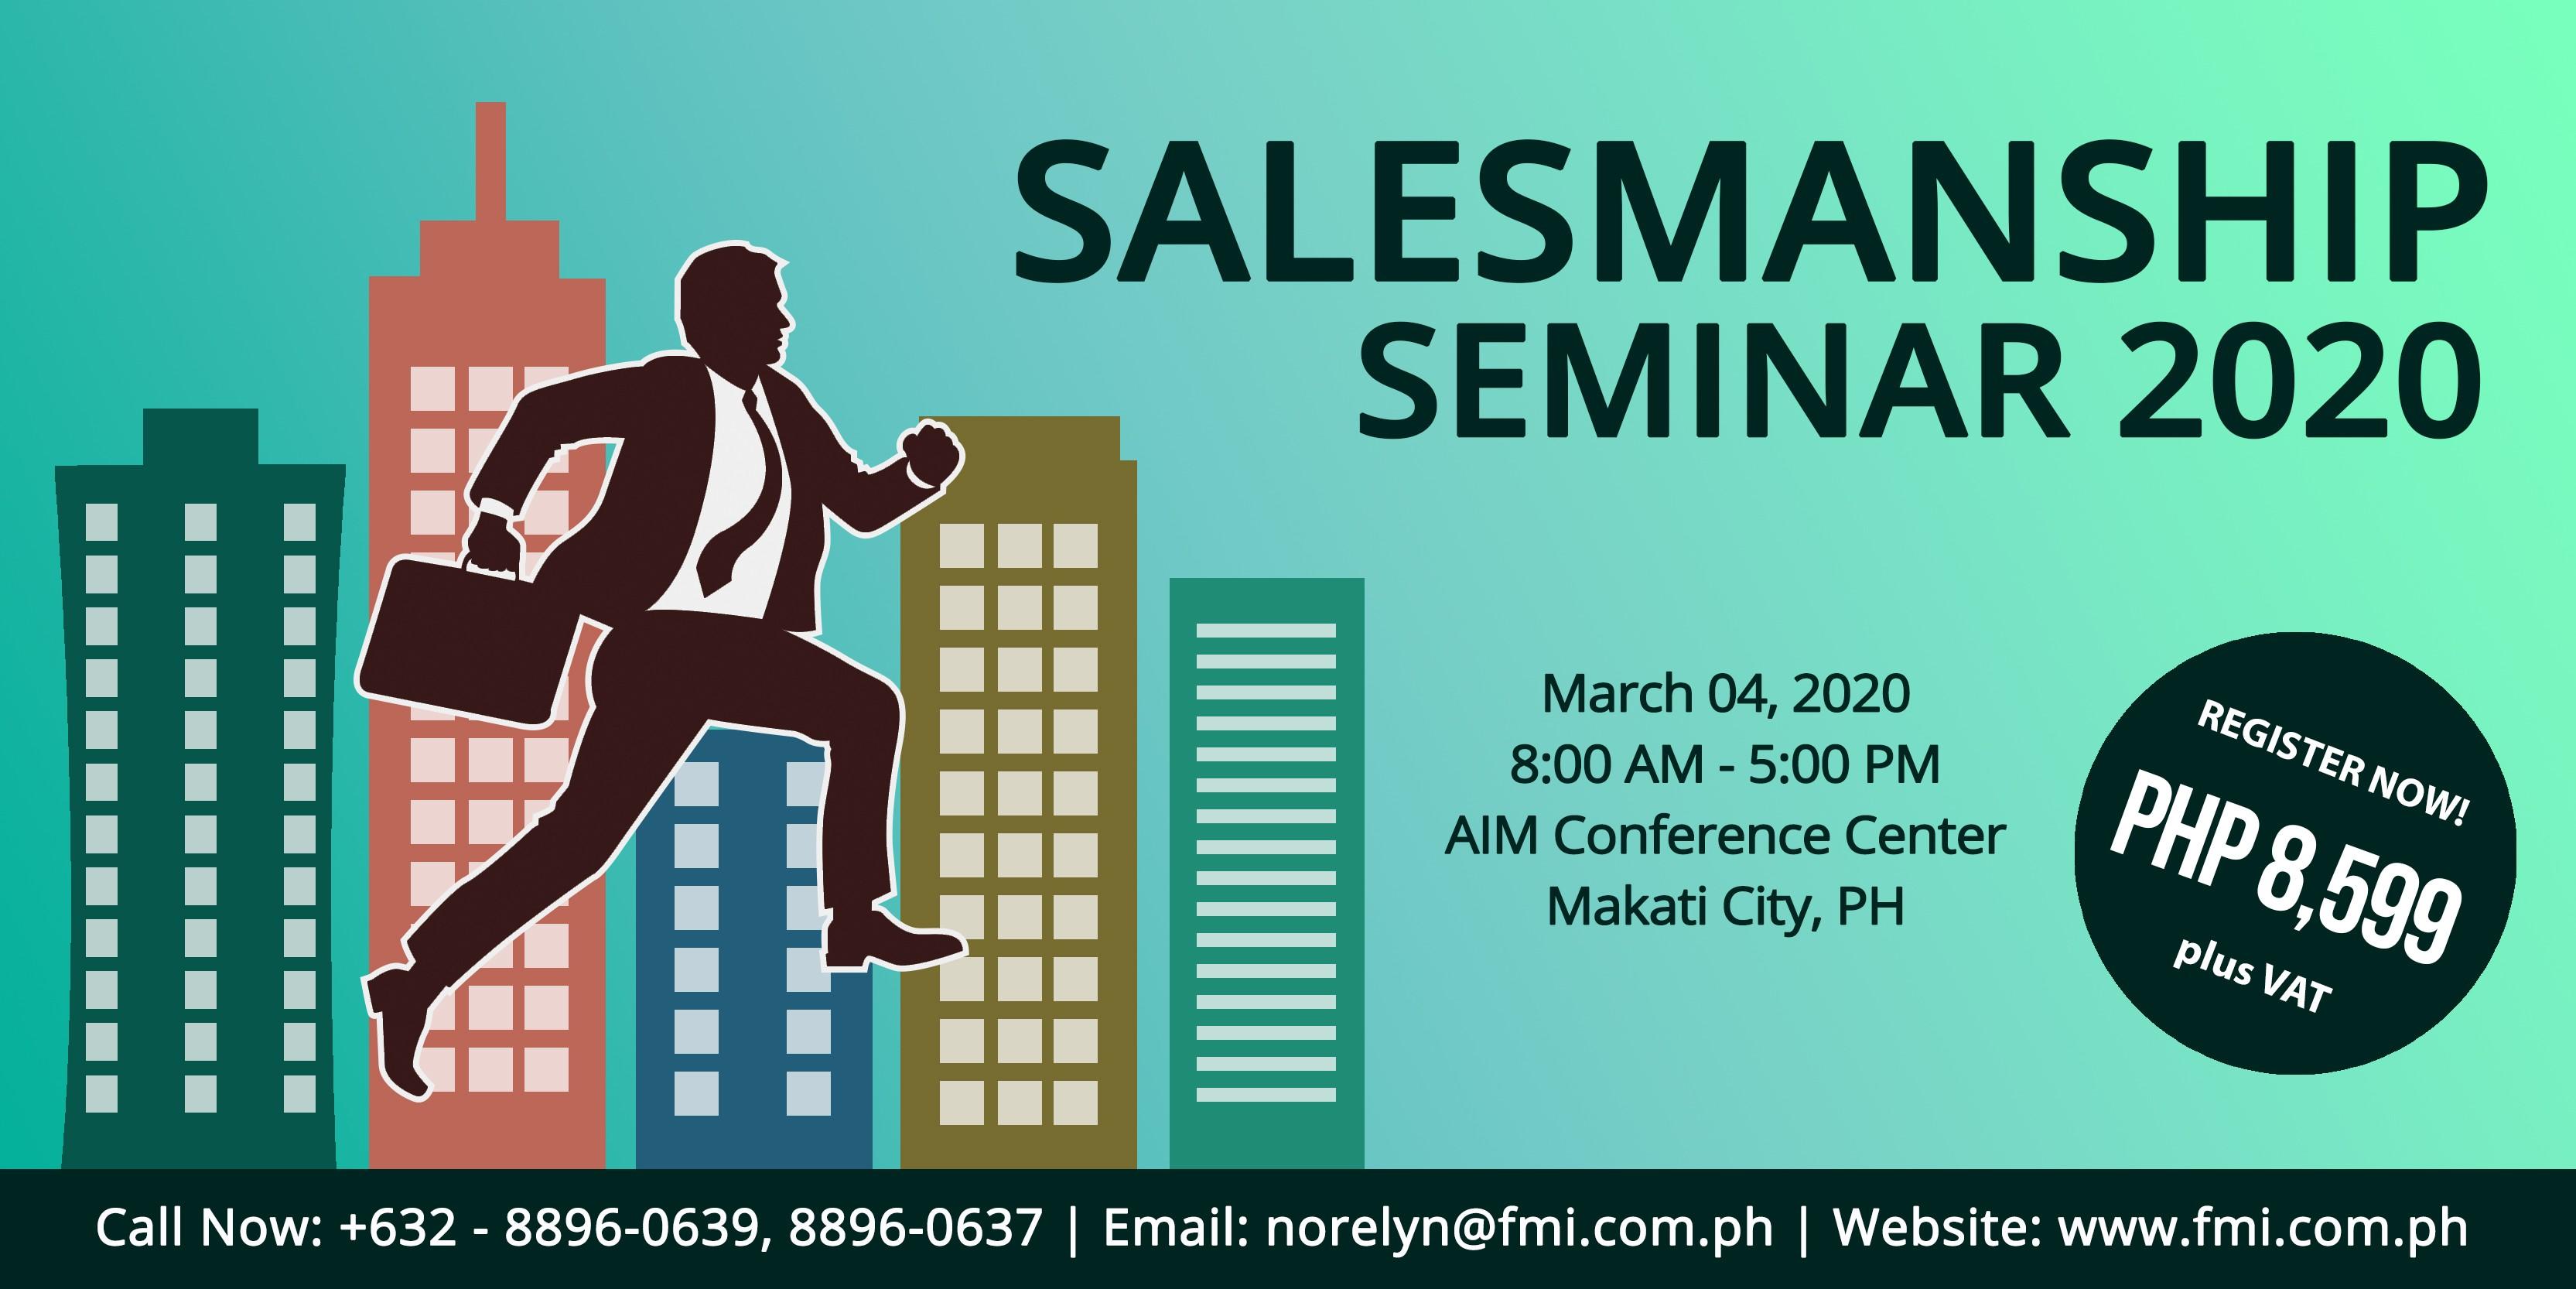 Salesmanship Seminar 2020